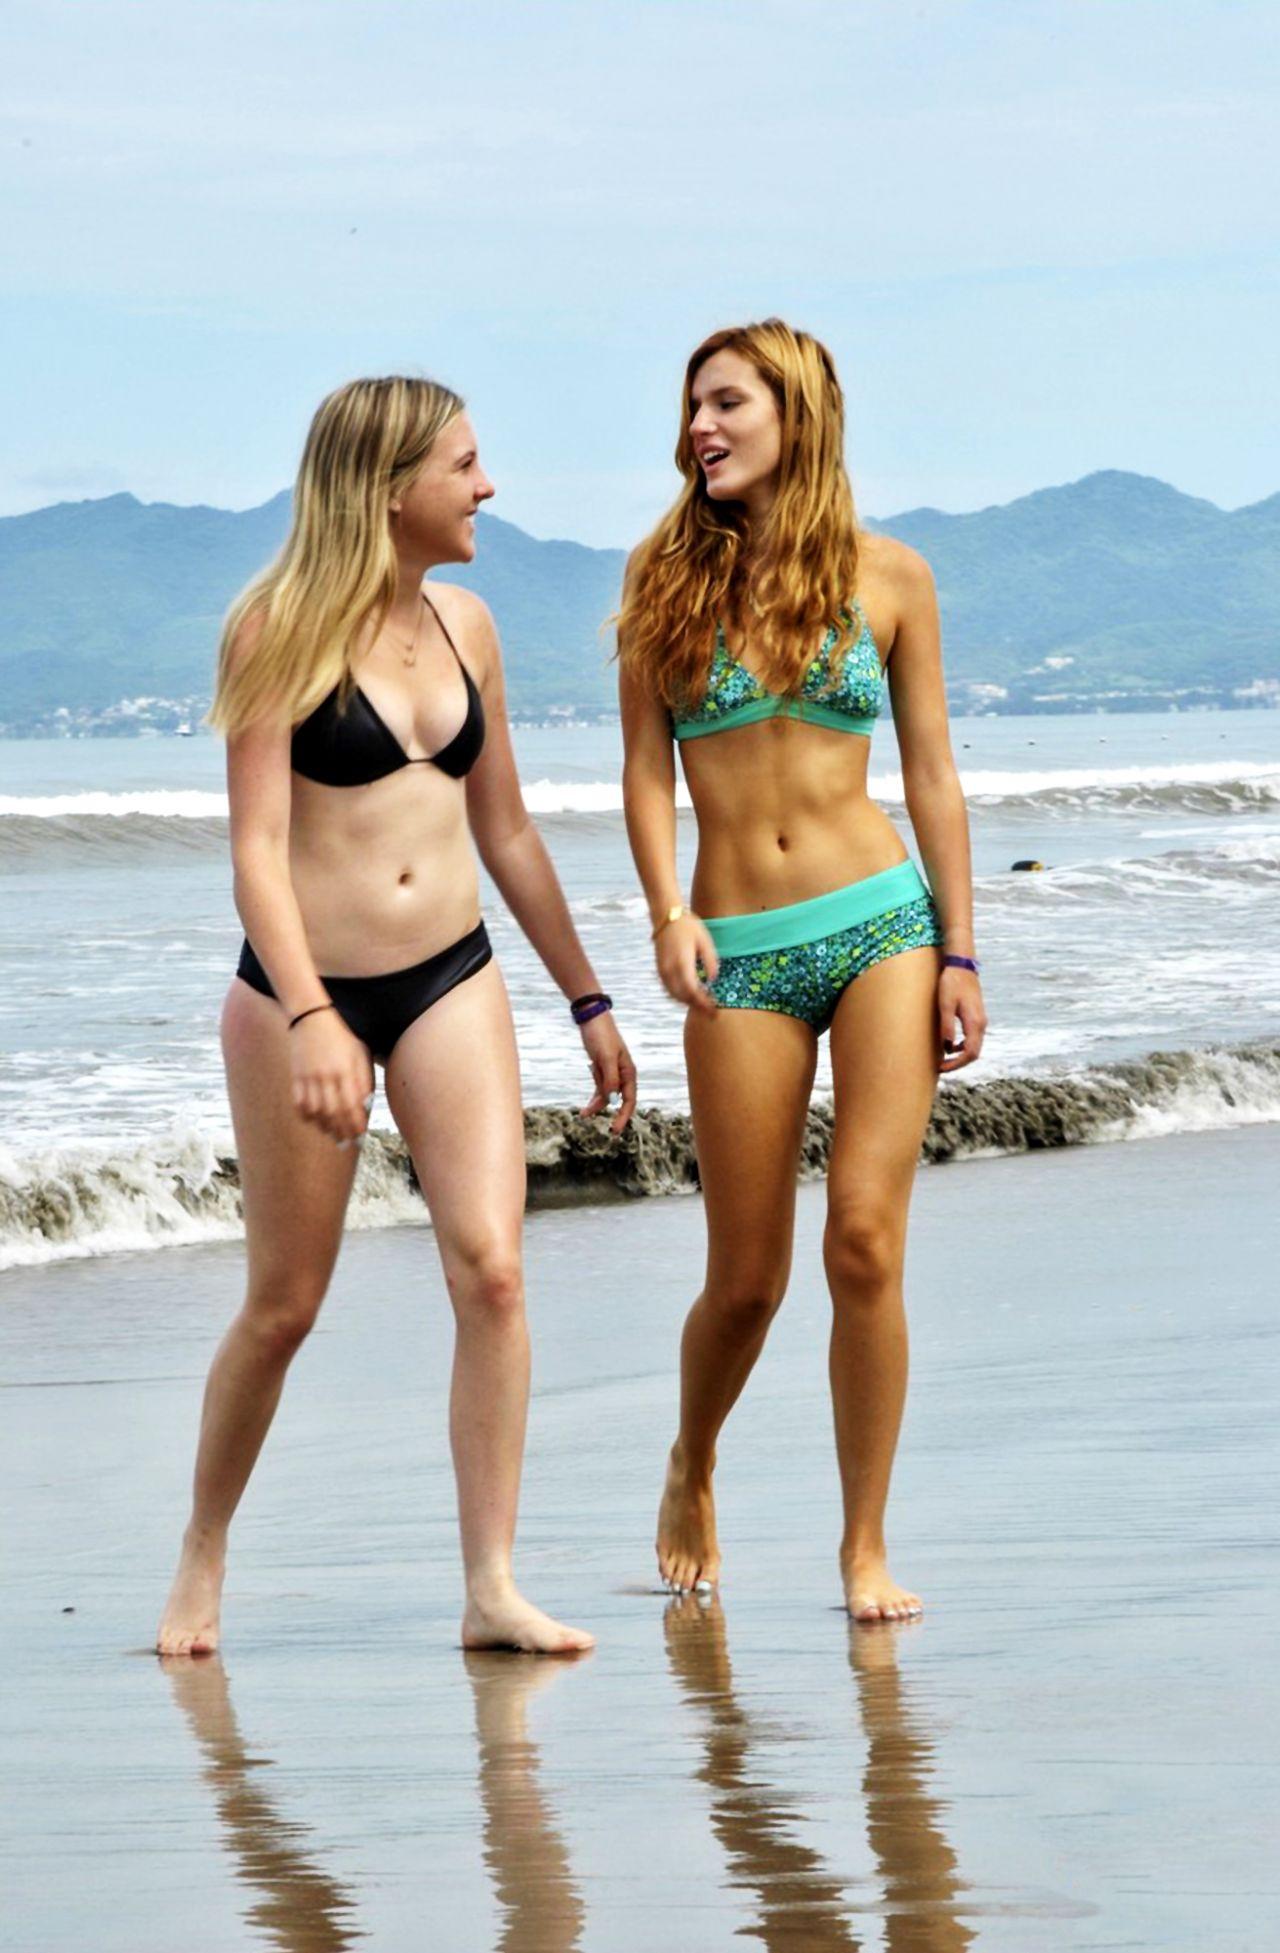 Bikini Bella Avery Thorne nudes (33 photos), Sexy, Sideboobs, Twitter, lingerie 2015